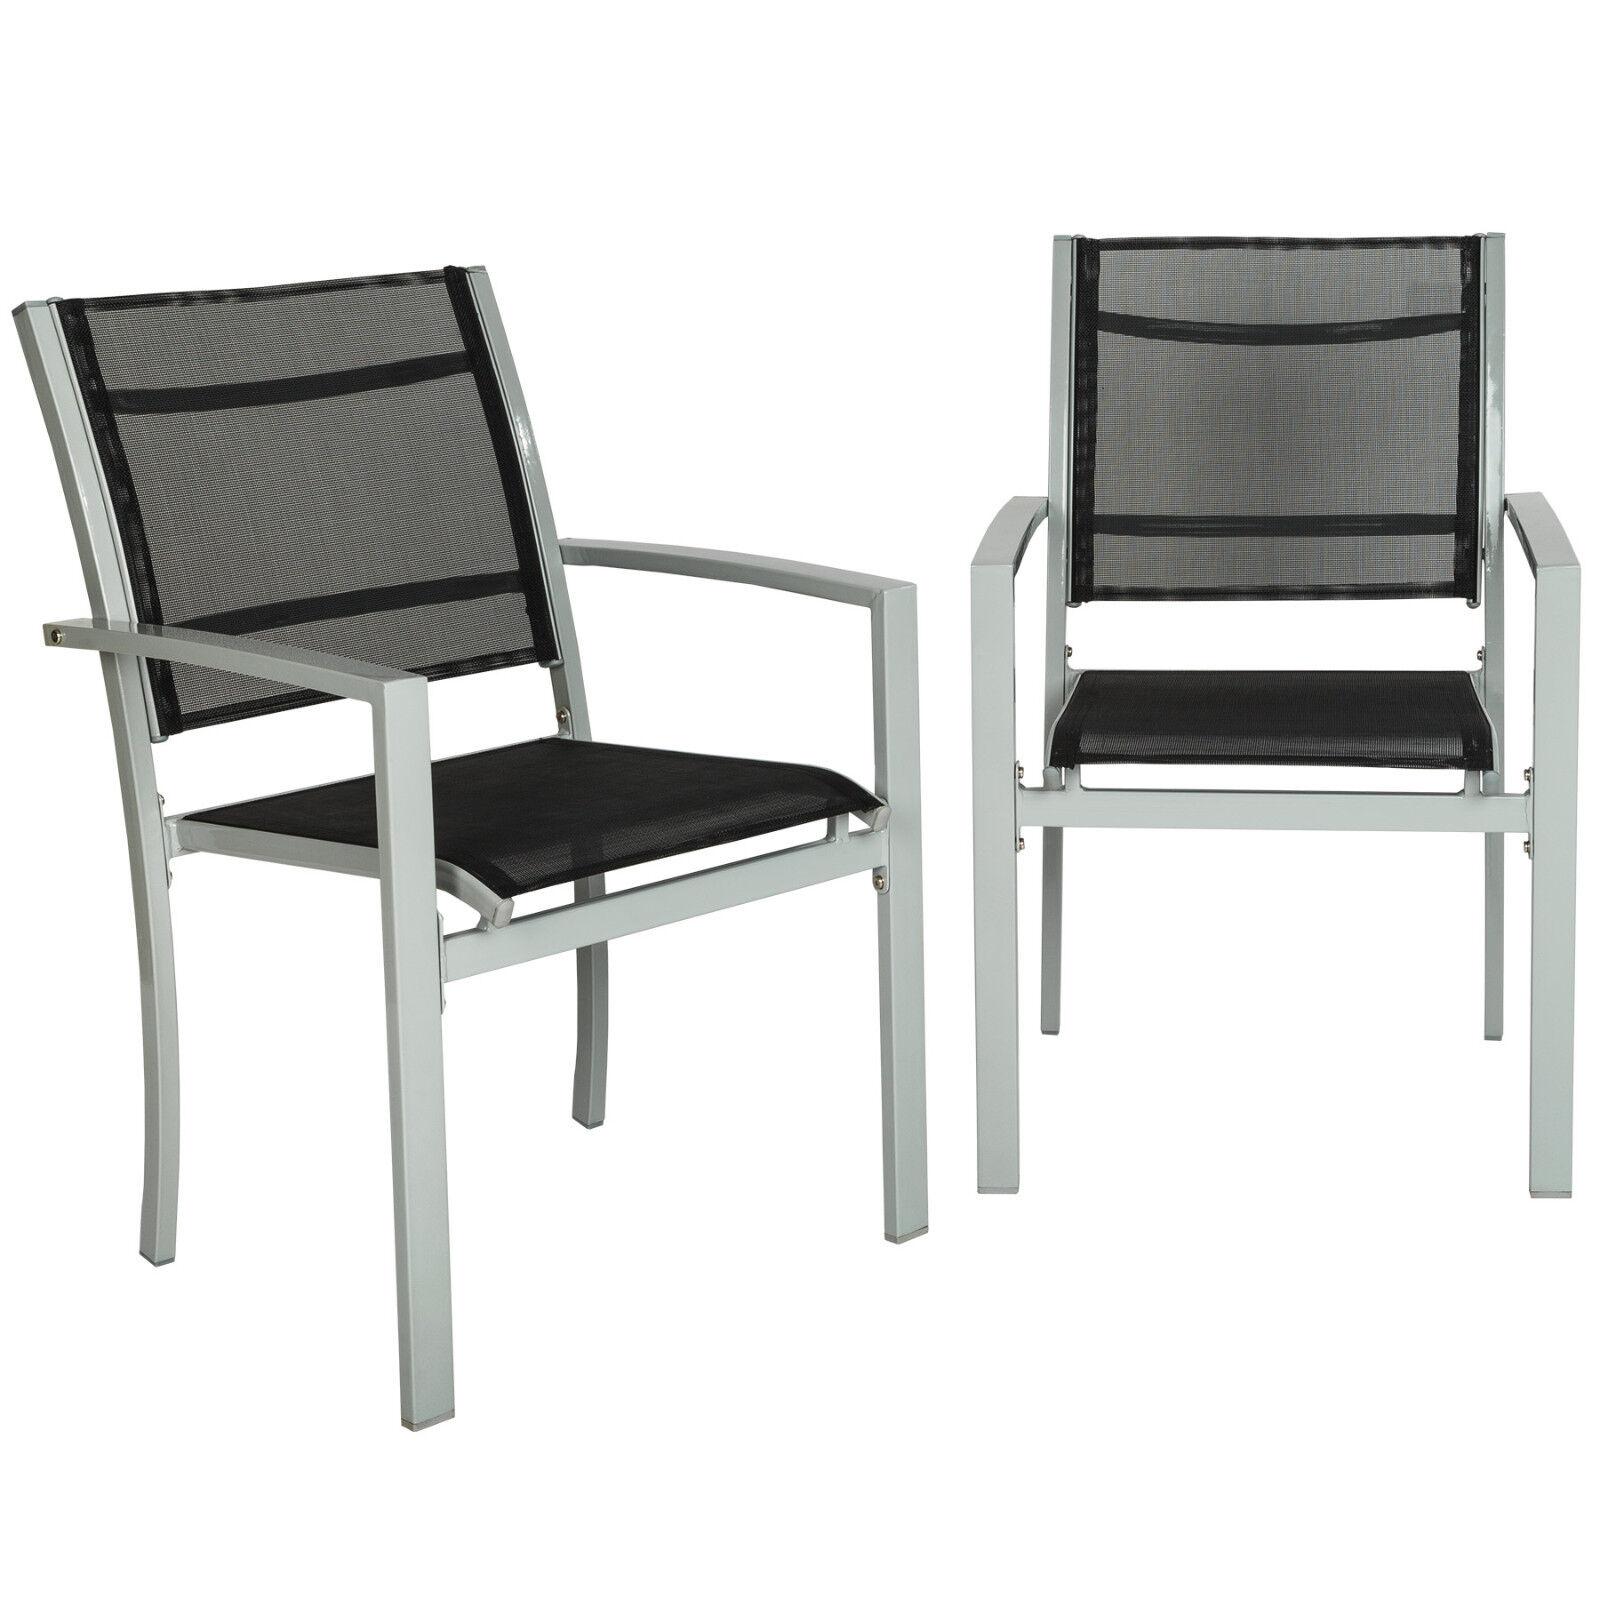 Silla de jardín sillas de balcón de jardín butaca terraza metal silla set gris